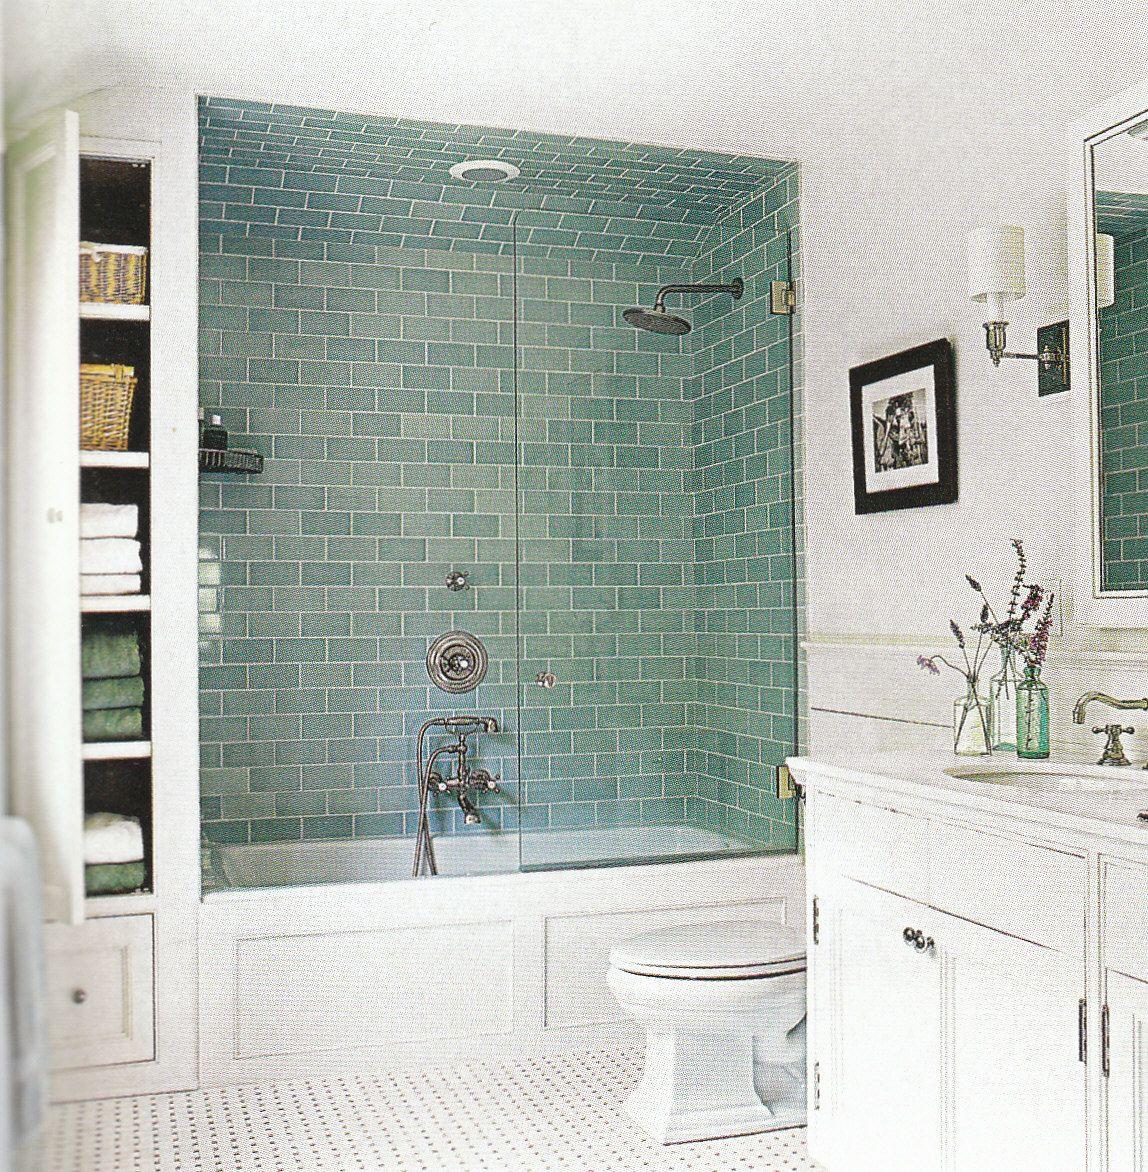 Frosted Sage Green Glass Subway Tile Bathroom Tub Shower Combo Bathtub Shower Combo Bathroom Tub Shower